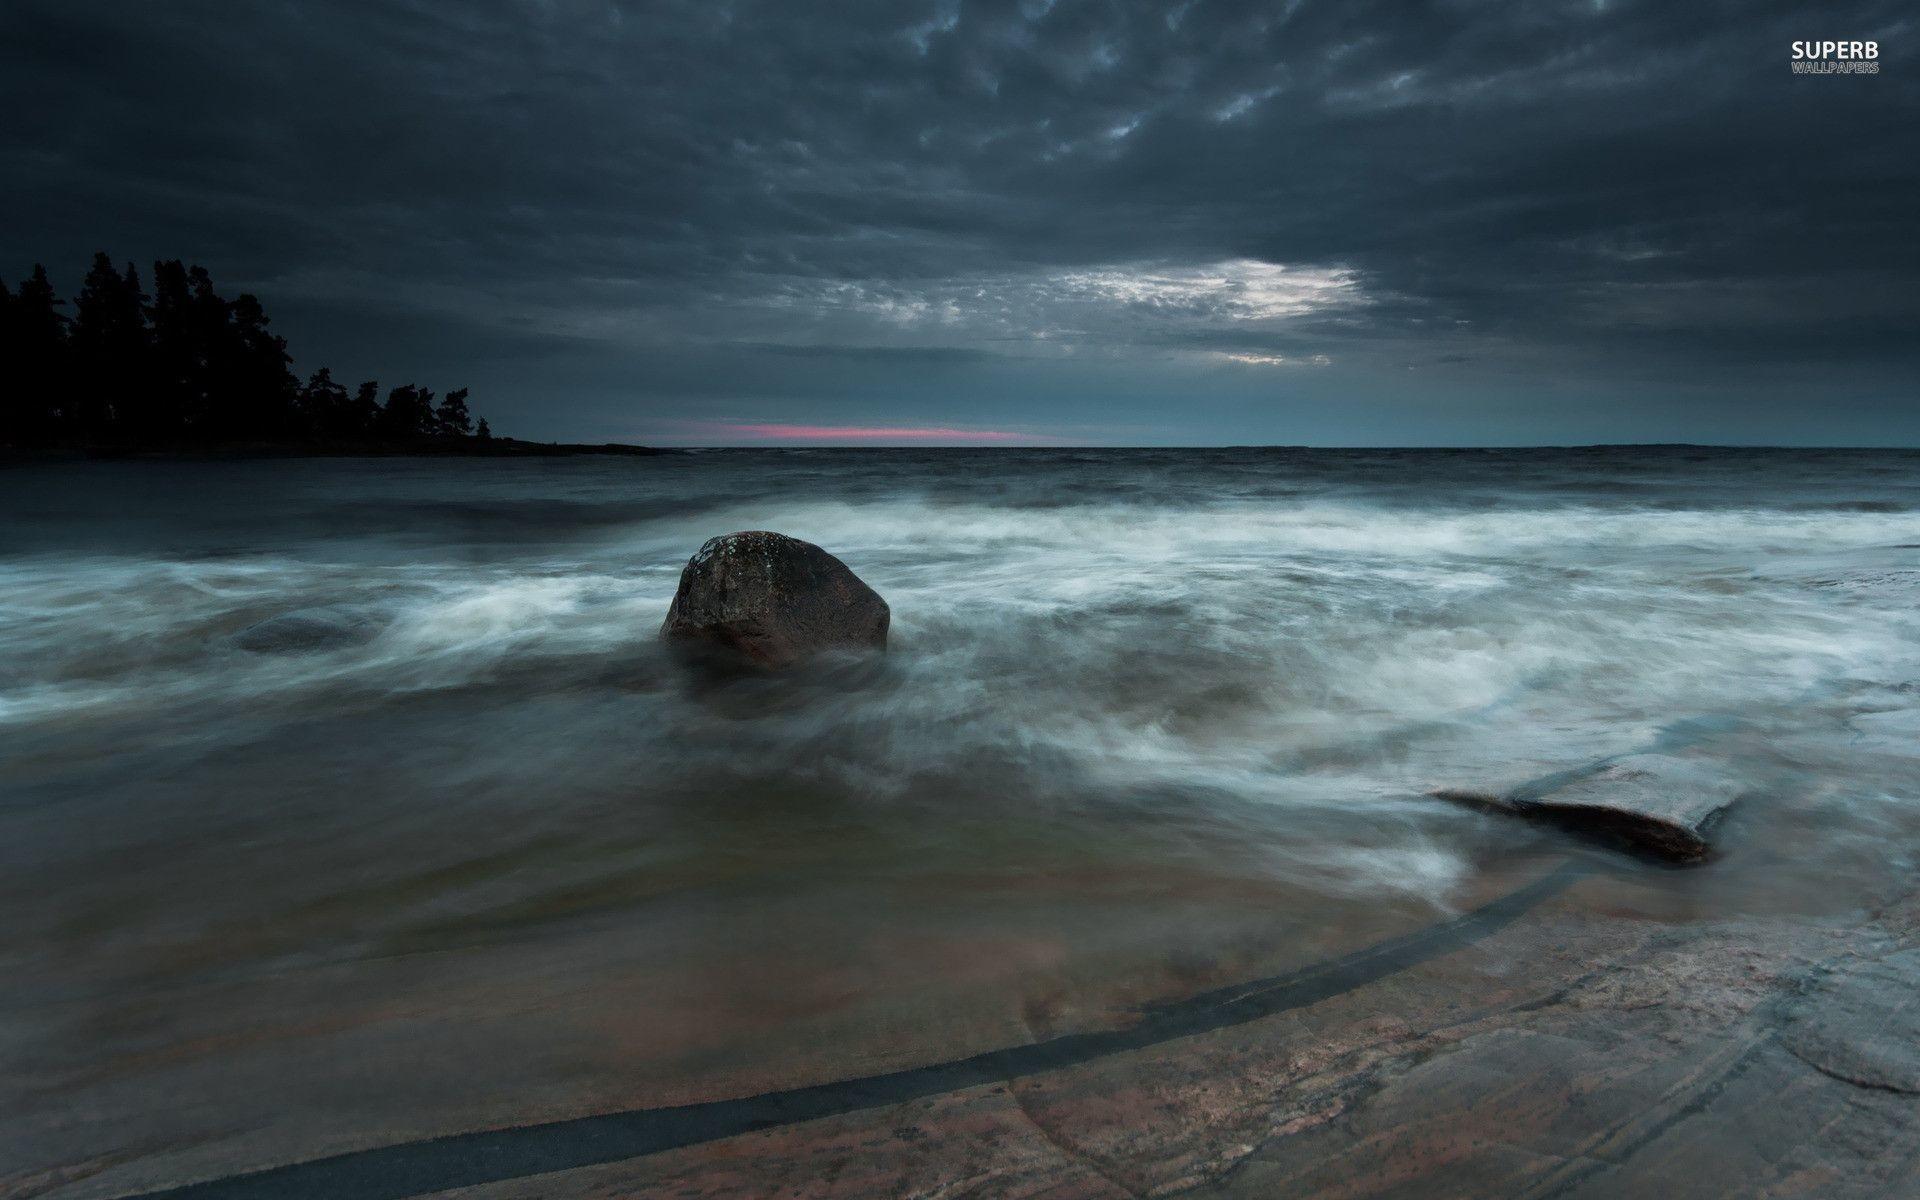 Stormy sea wallpaper – Beach wallpapers – #